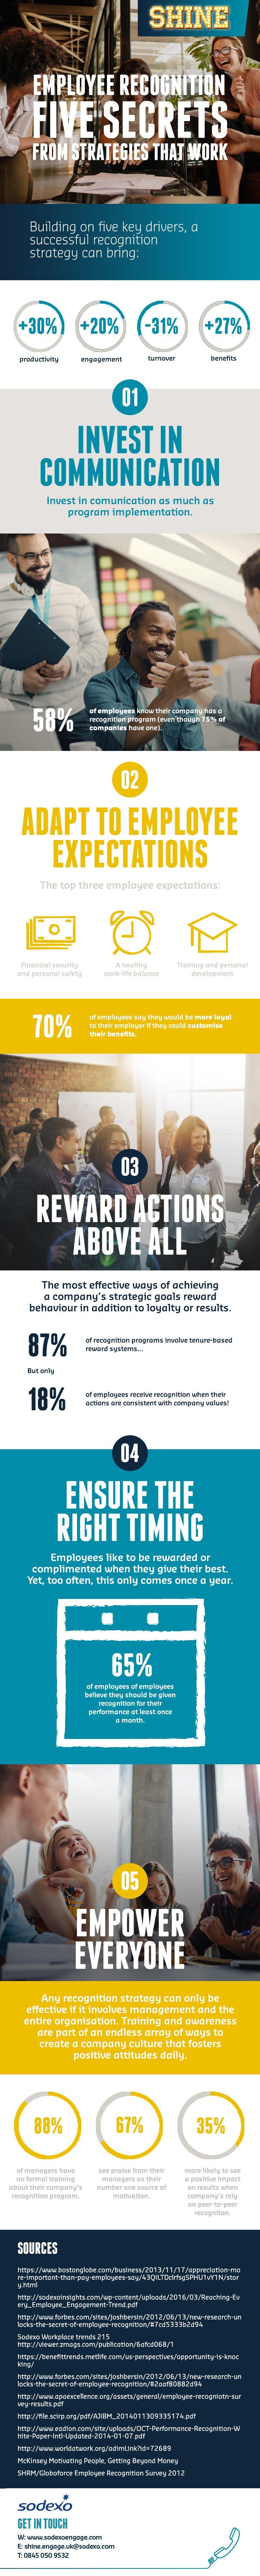 SHINE-Employee-Recognition---Top-Five-Secrets.jpg